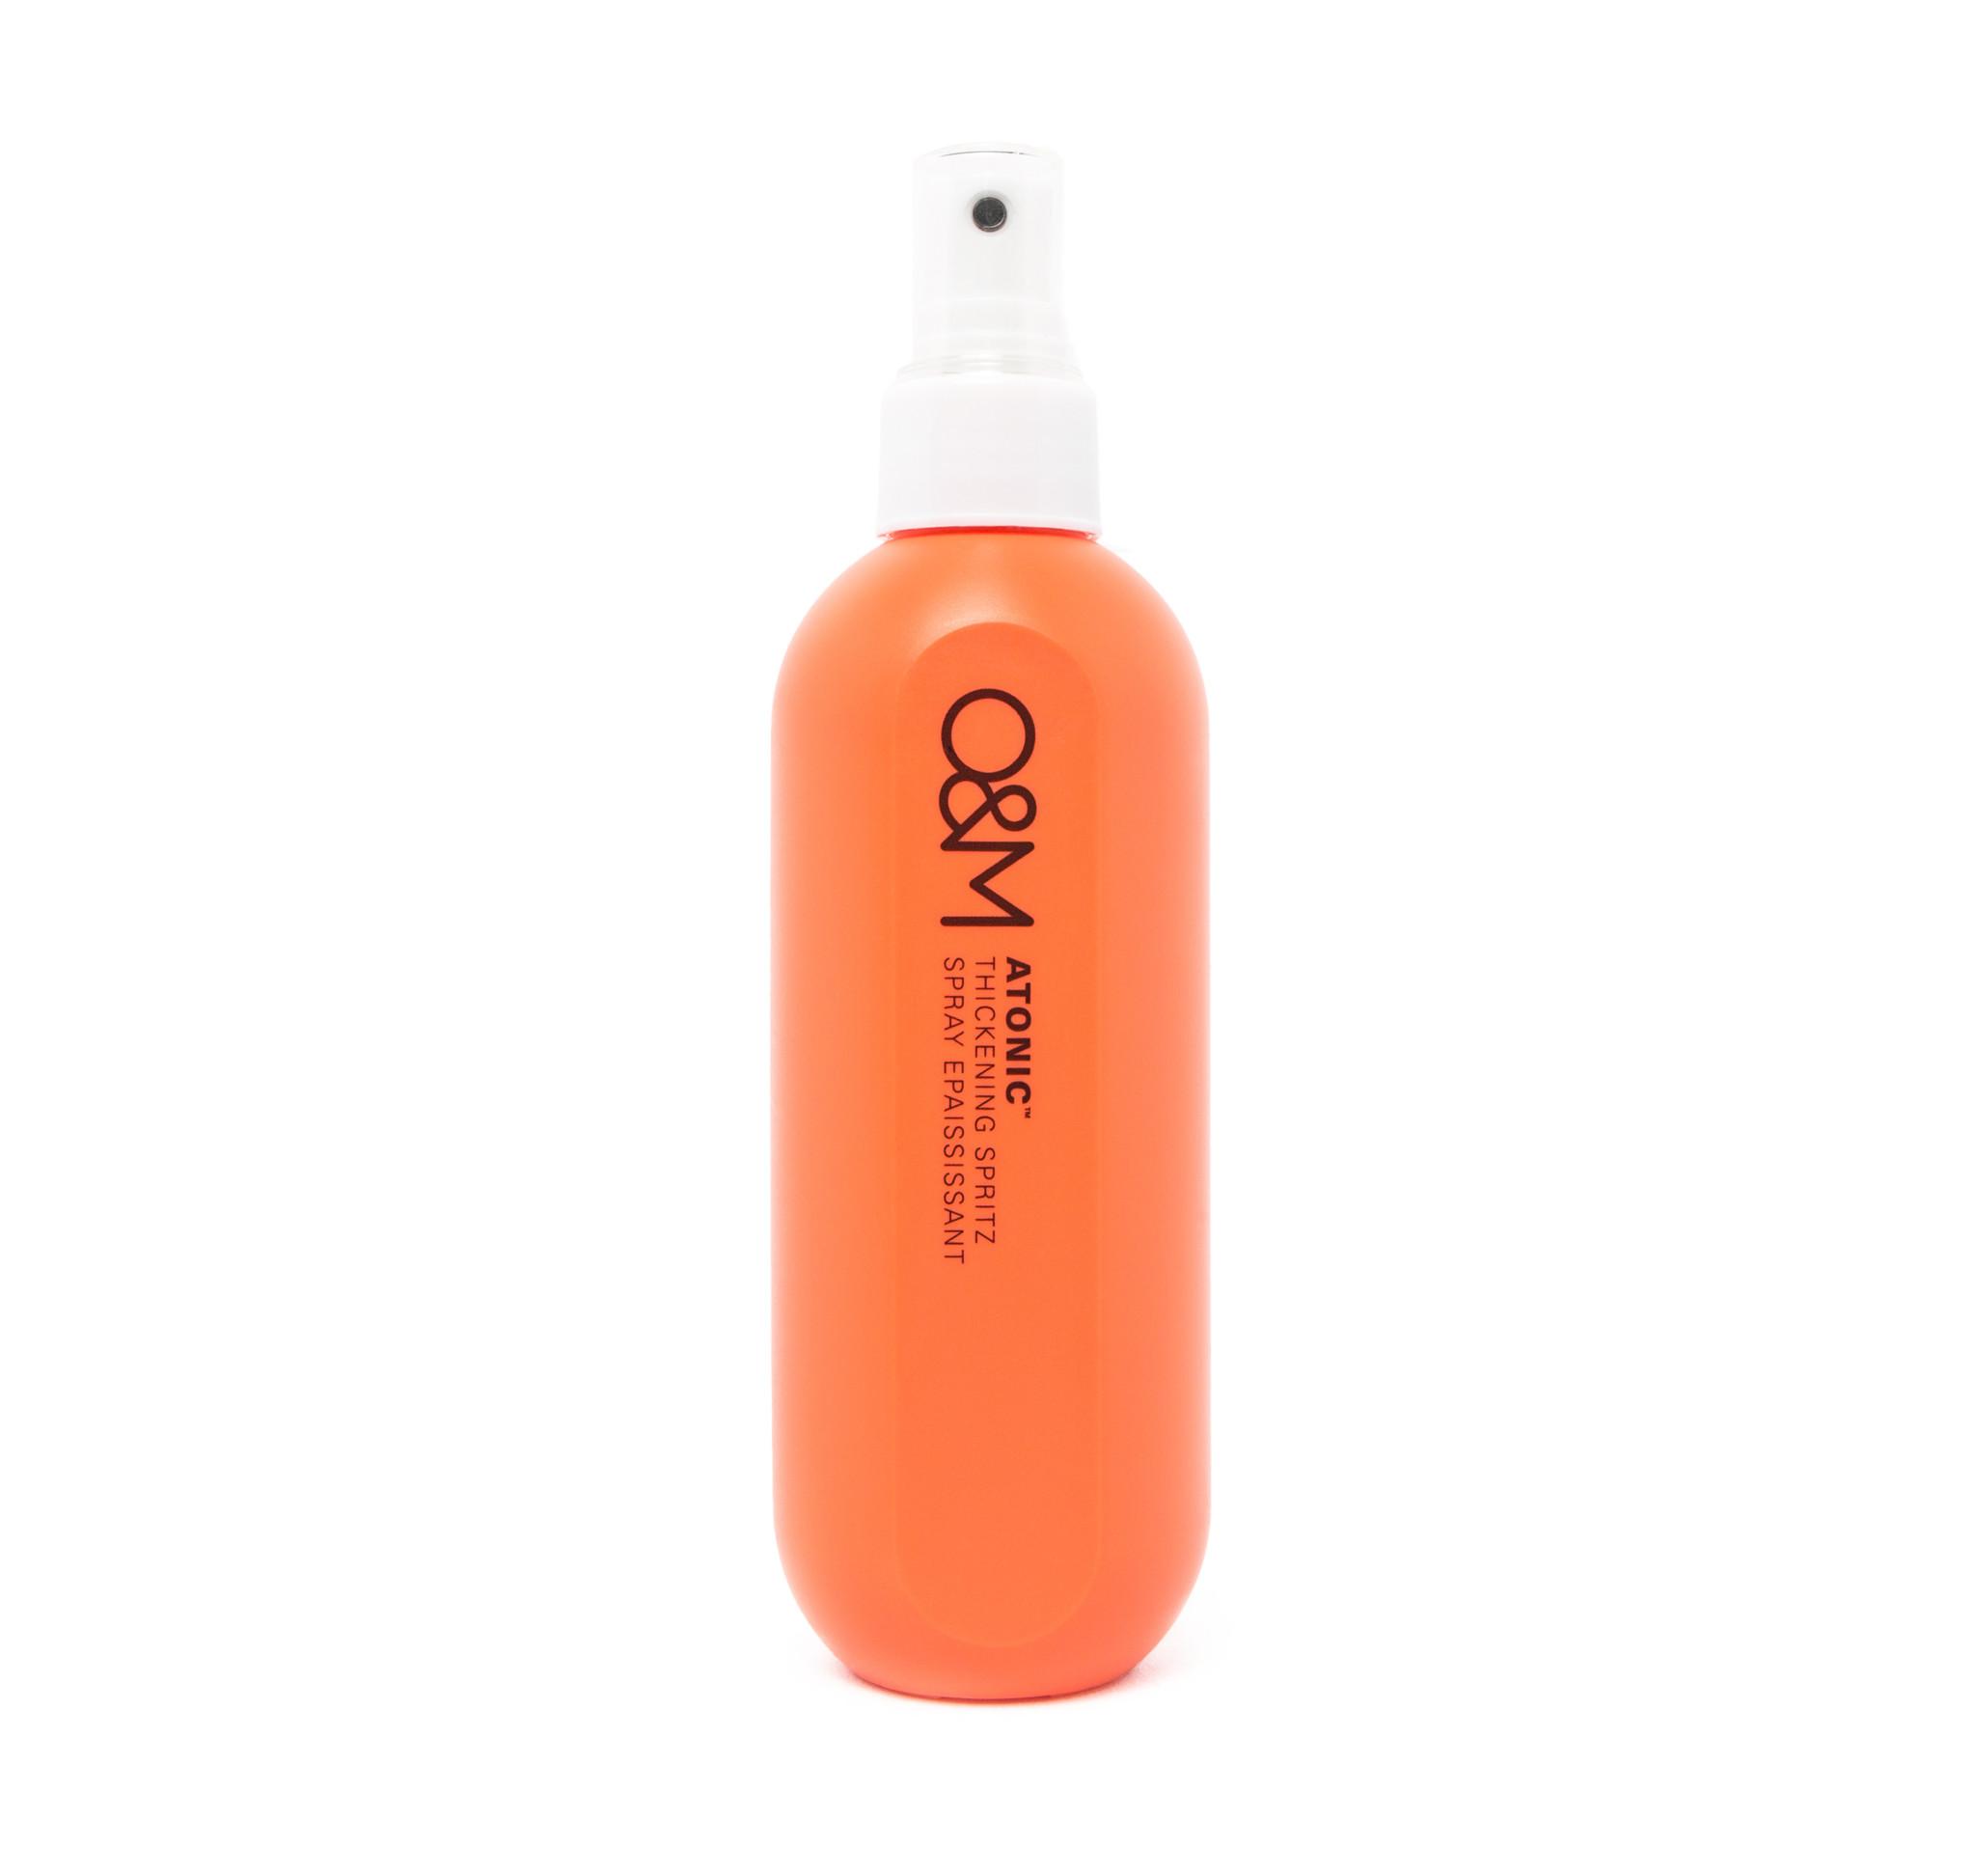 O&M - Original Mineral O&M Atonic Thickening Spritz - Spray épaississant  - 250 ml